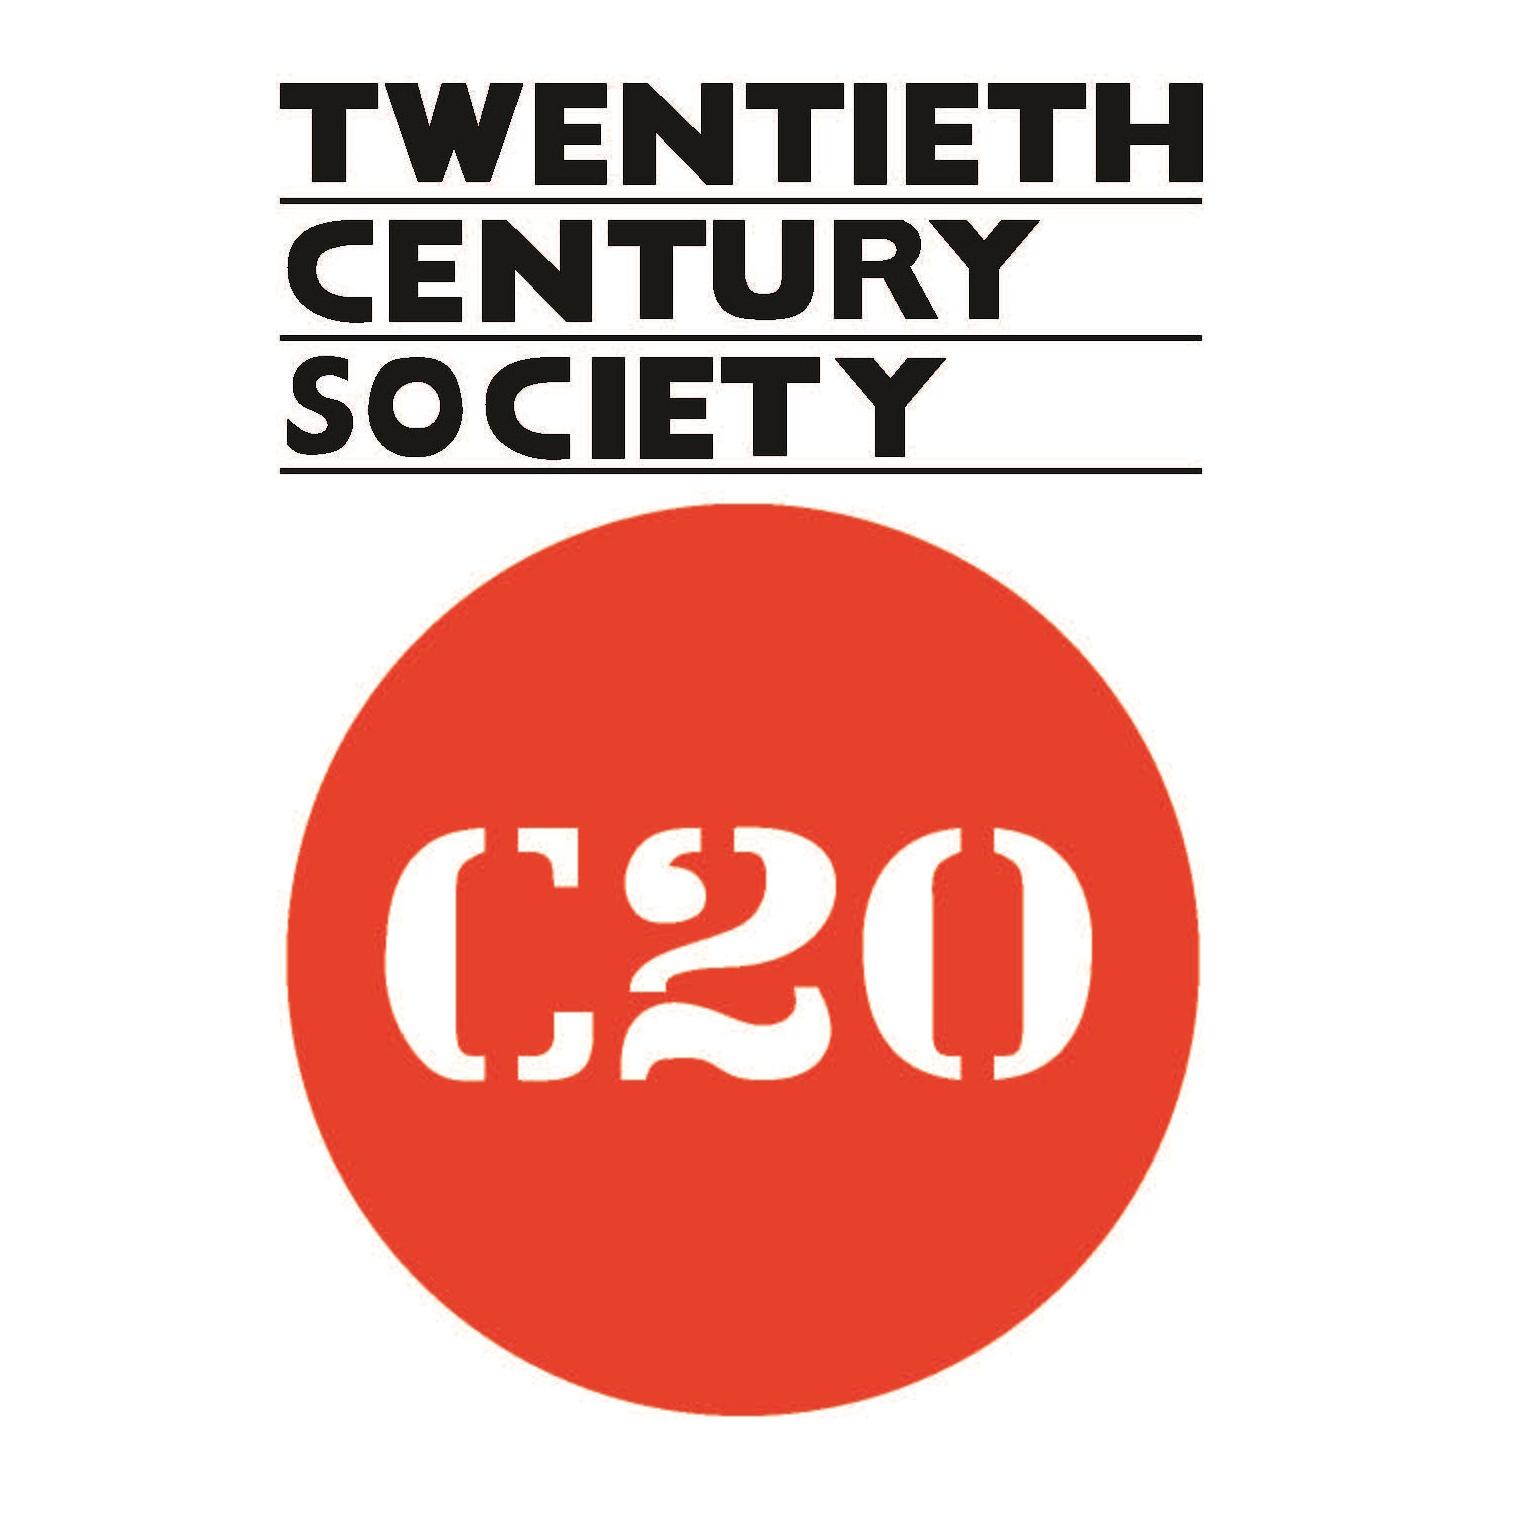 Twentieth Century Society   (Supporters)